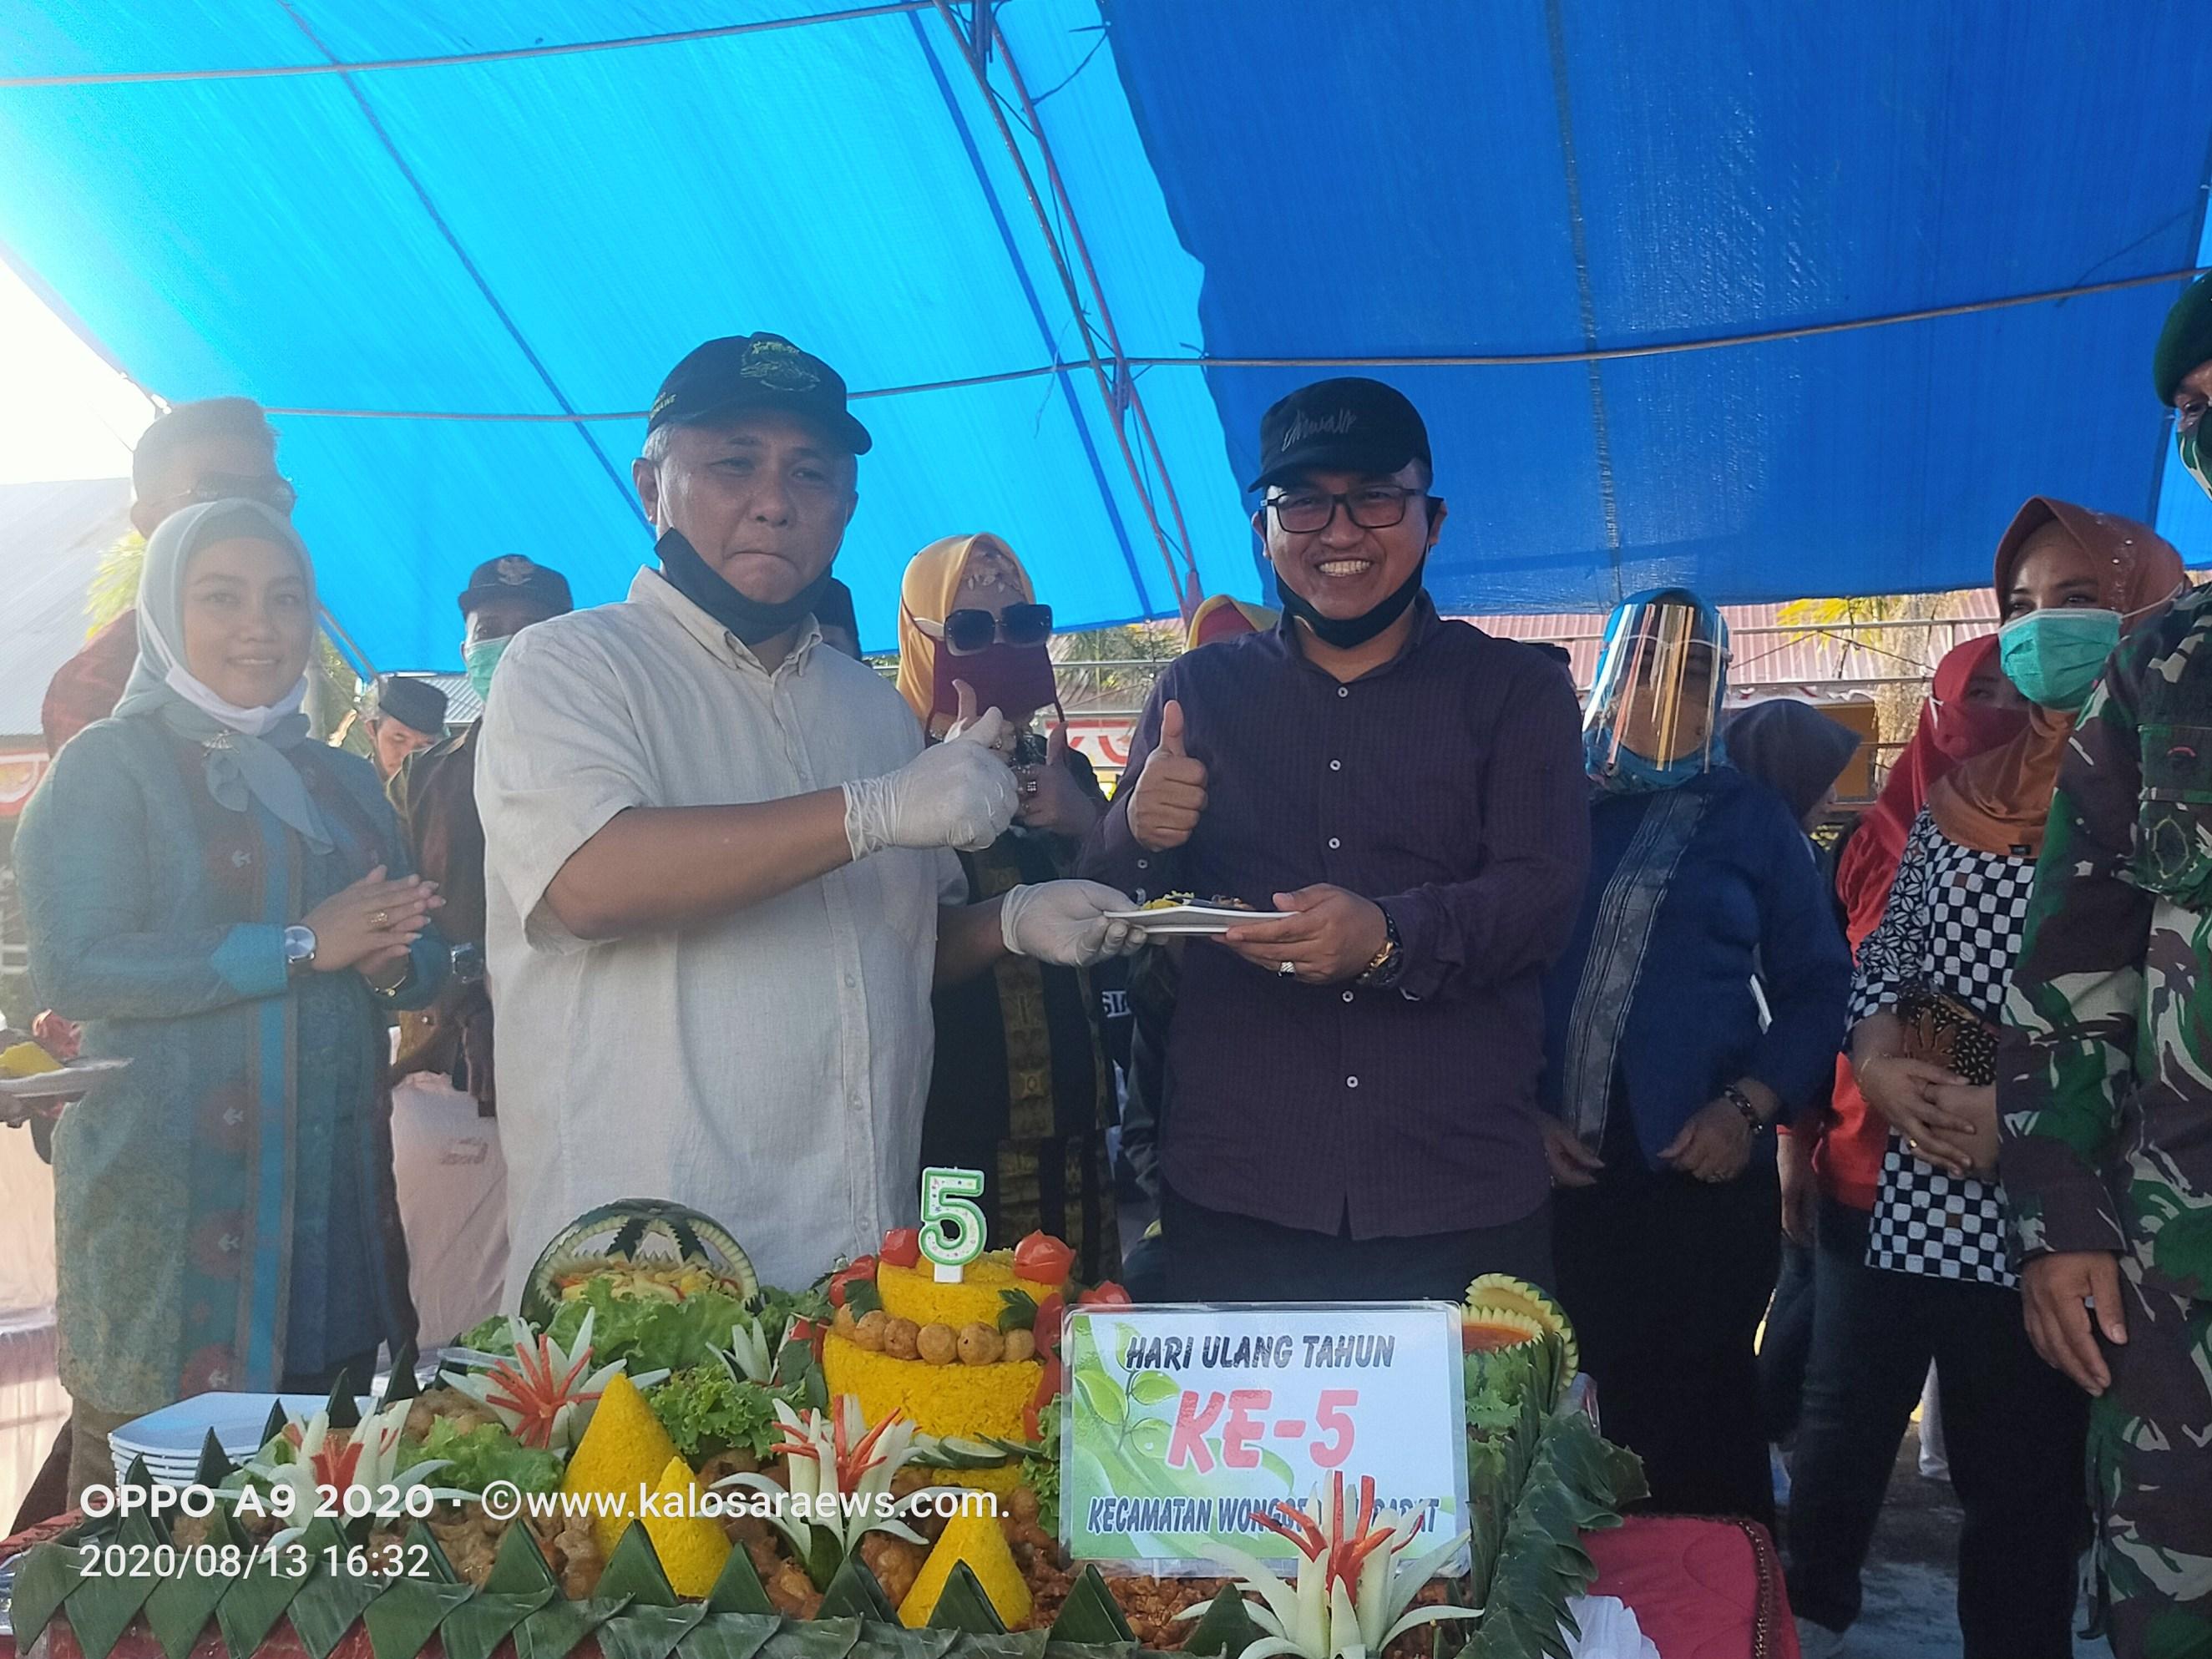 Ketgam : Bupati Kery Saiful Konggoasa saat menyerahkan Tumpeng ke Ketua DPRD Konawe, Dr.H Ardin.